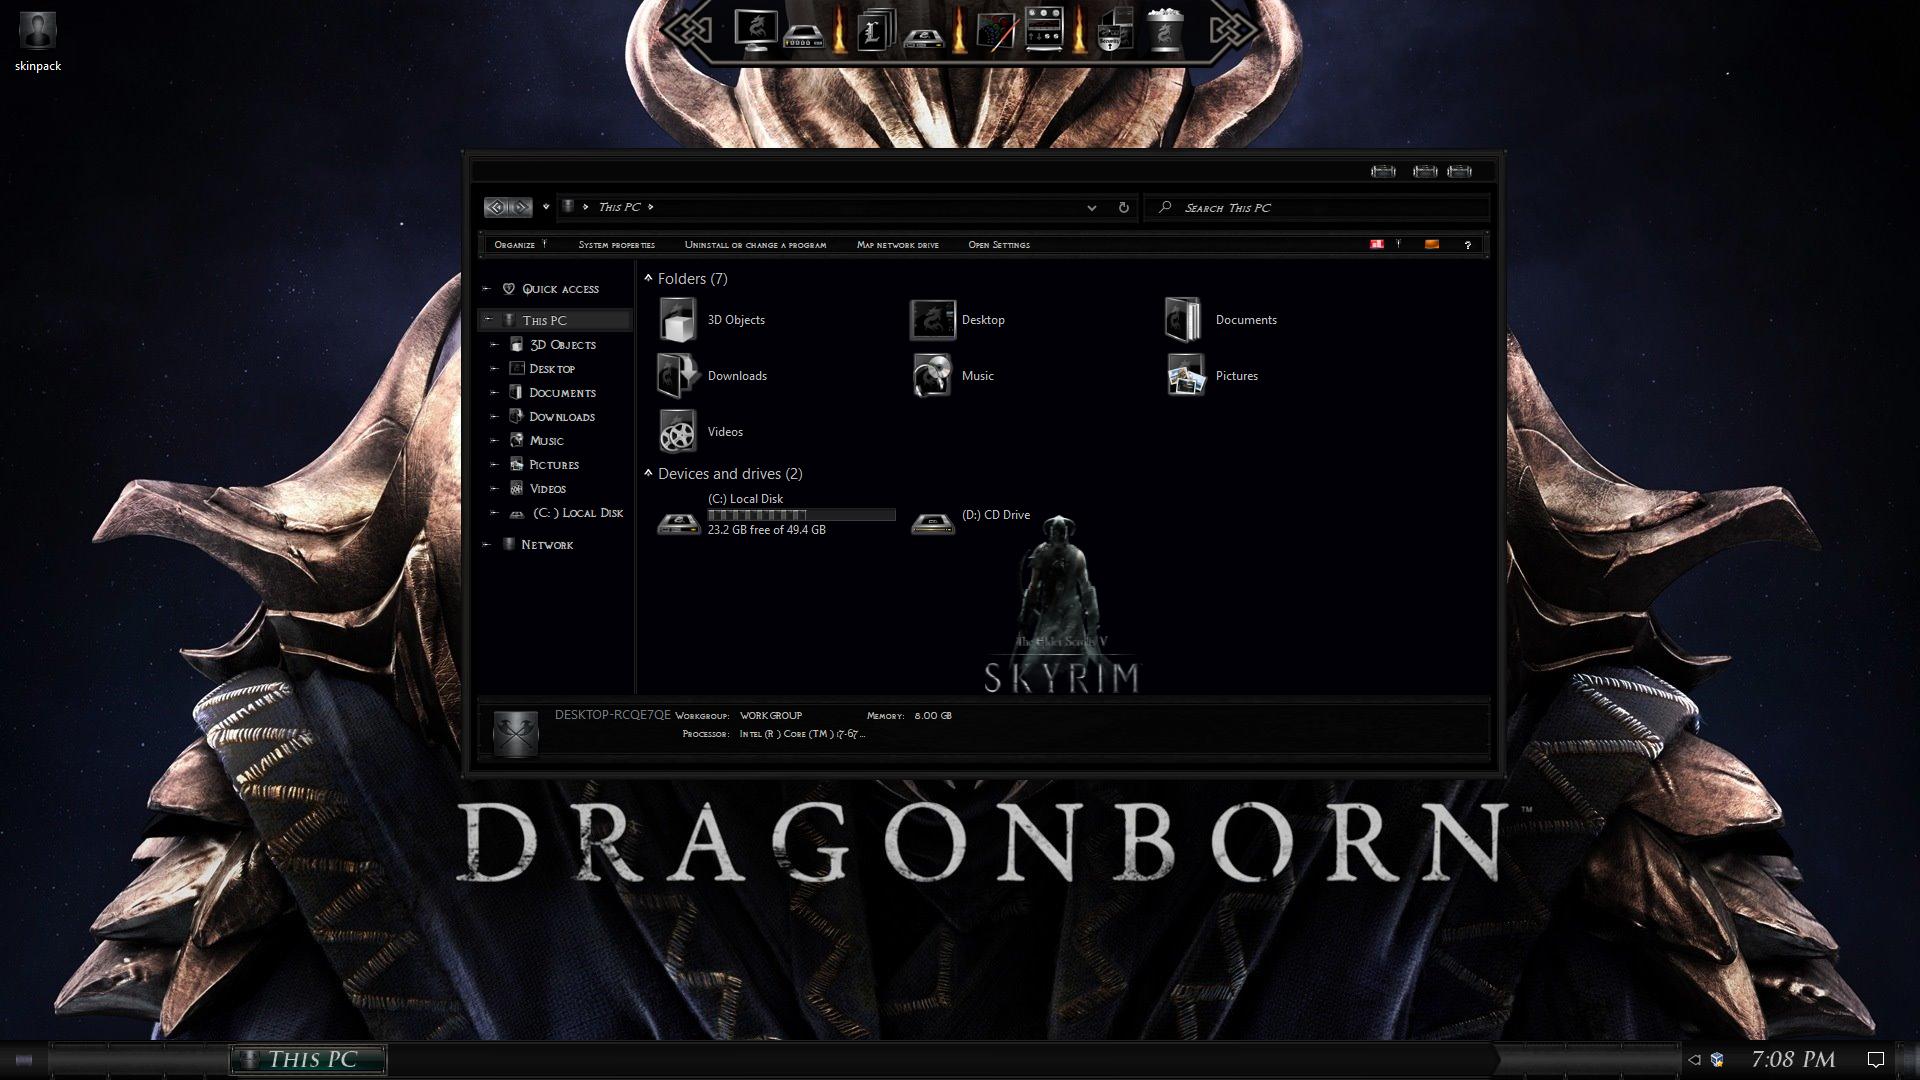 Skyrim Dragonborn Premium SkinPack for Windows 10